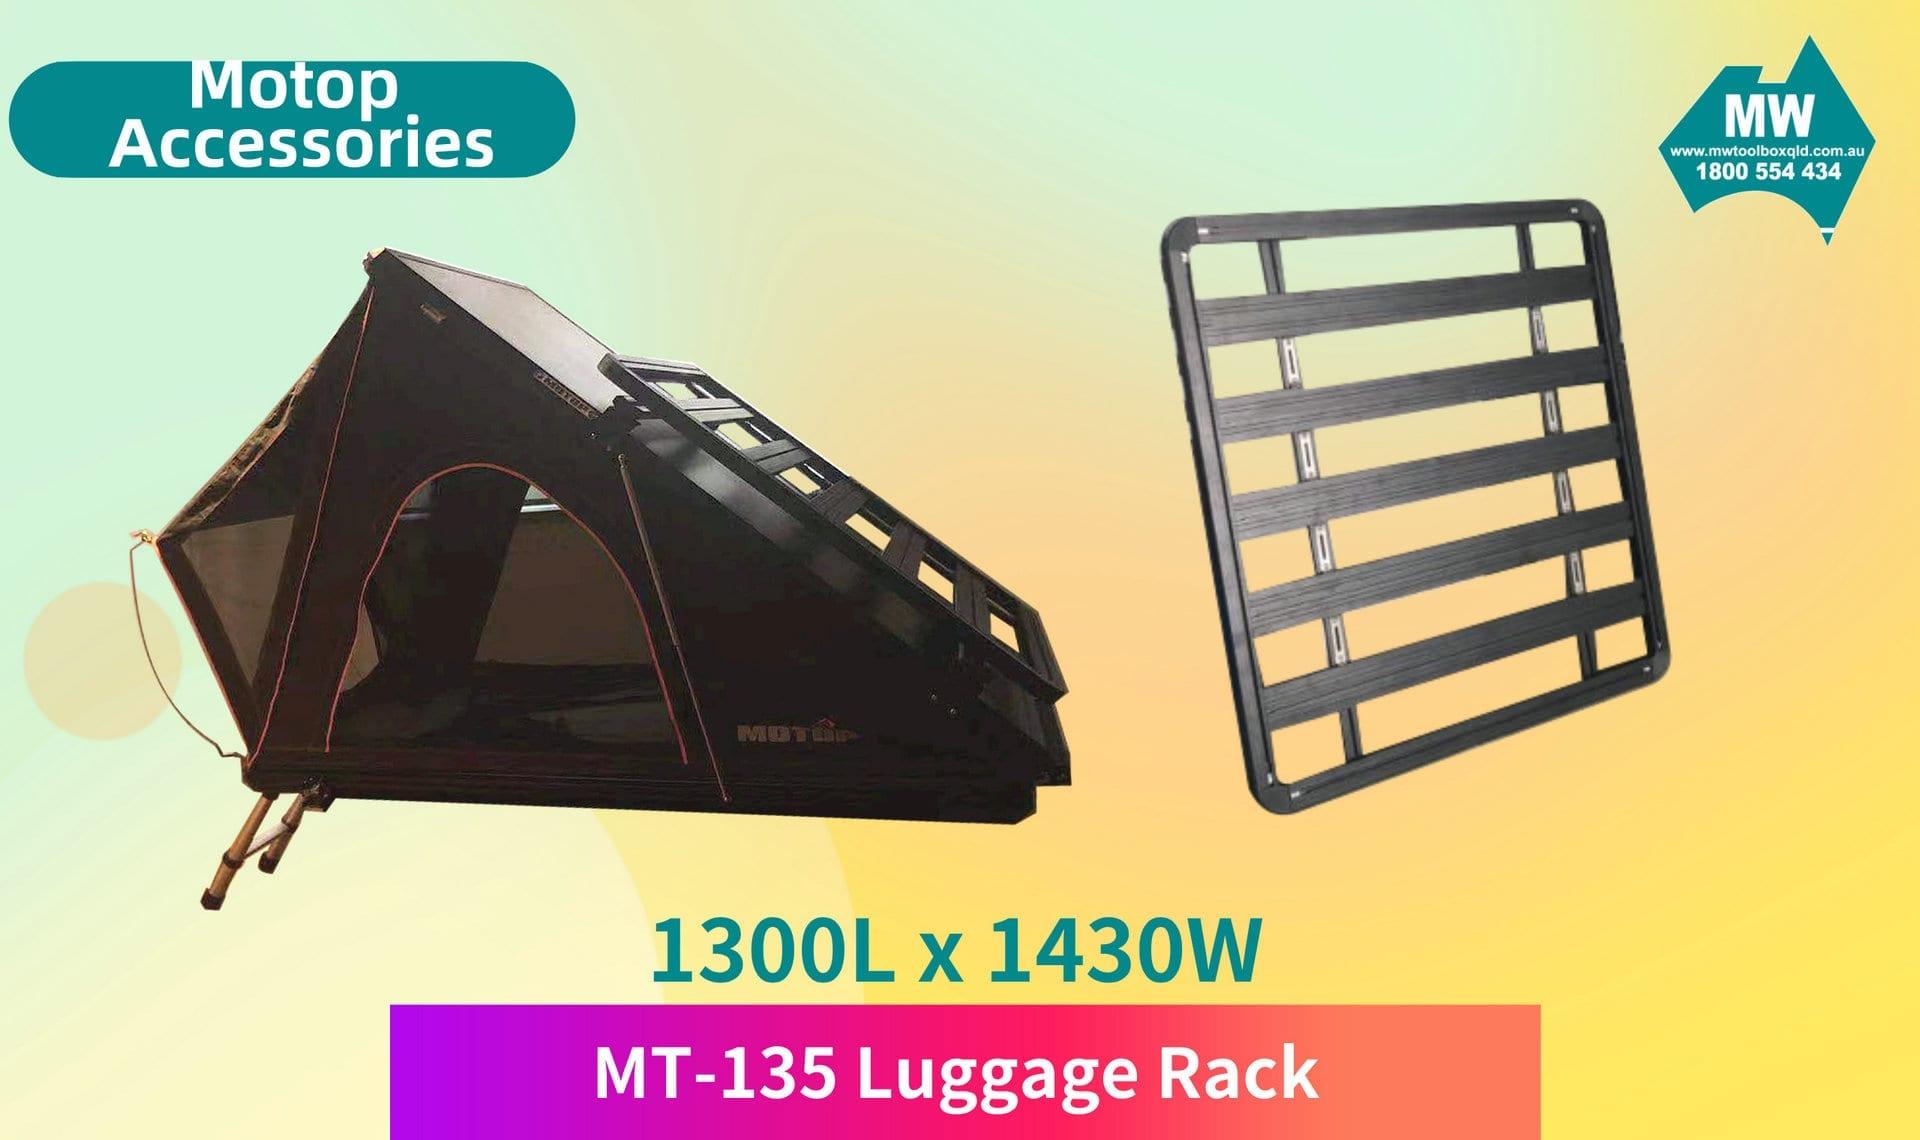 MT-135 Luggage Rack